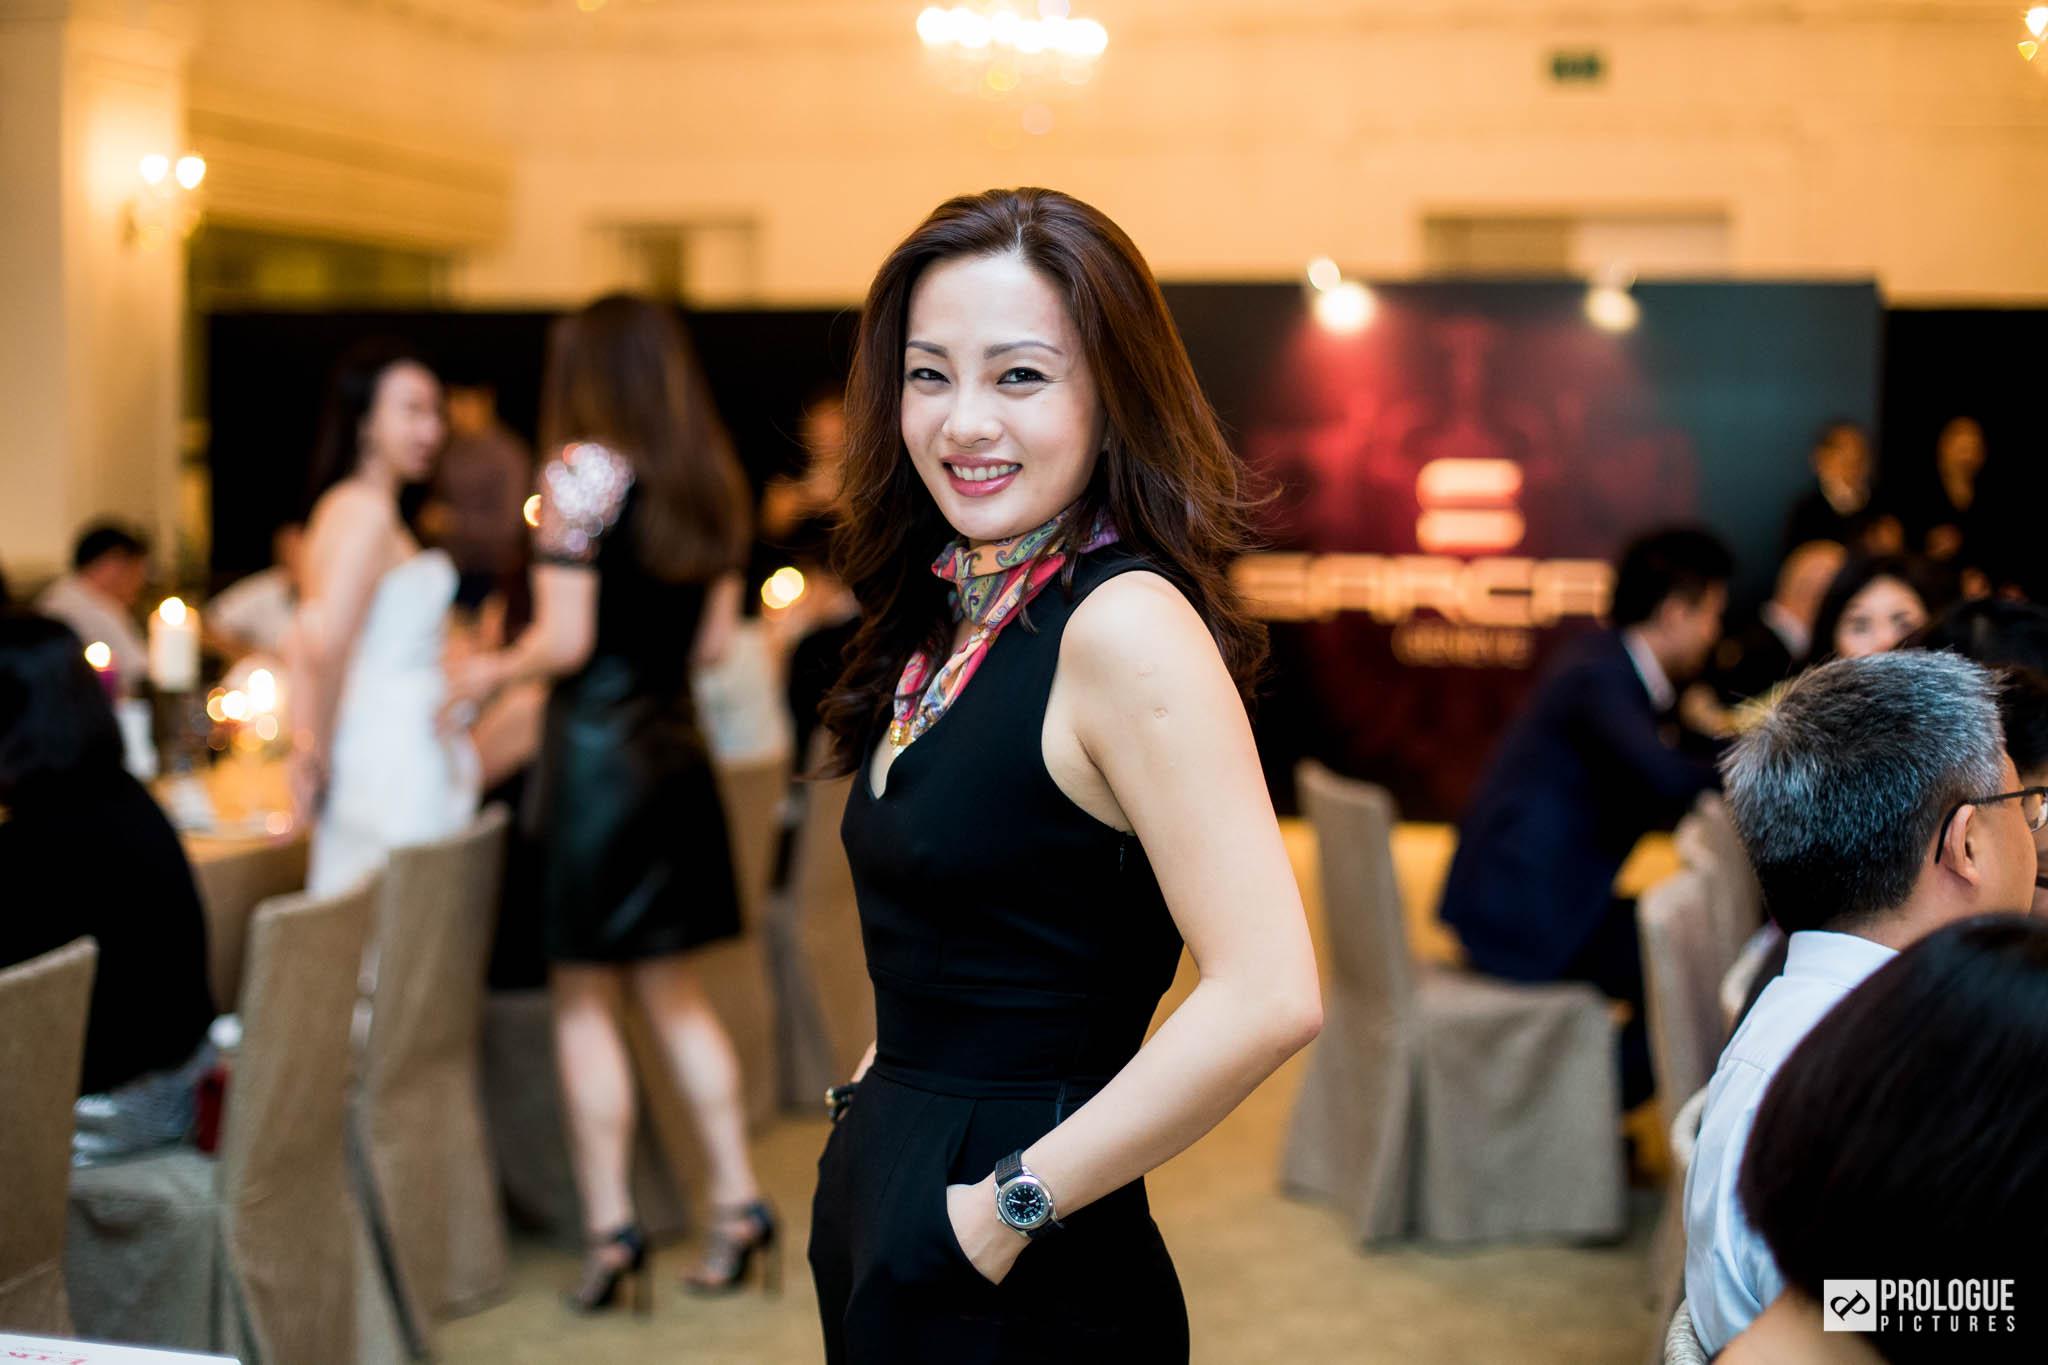 sarcar-le-carrousel-collection-event-photography-singapore-prologue-pictures-26